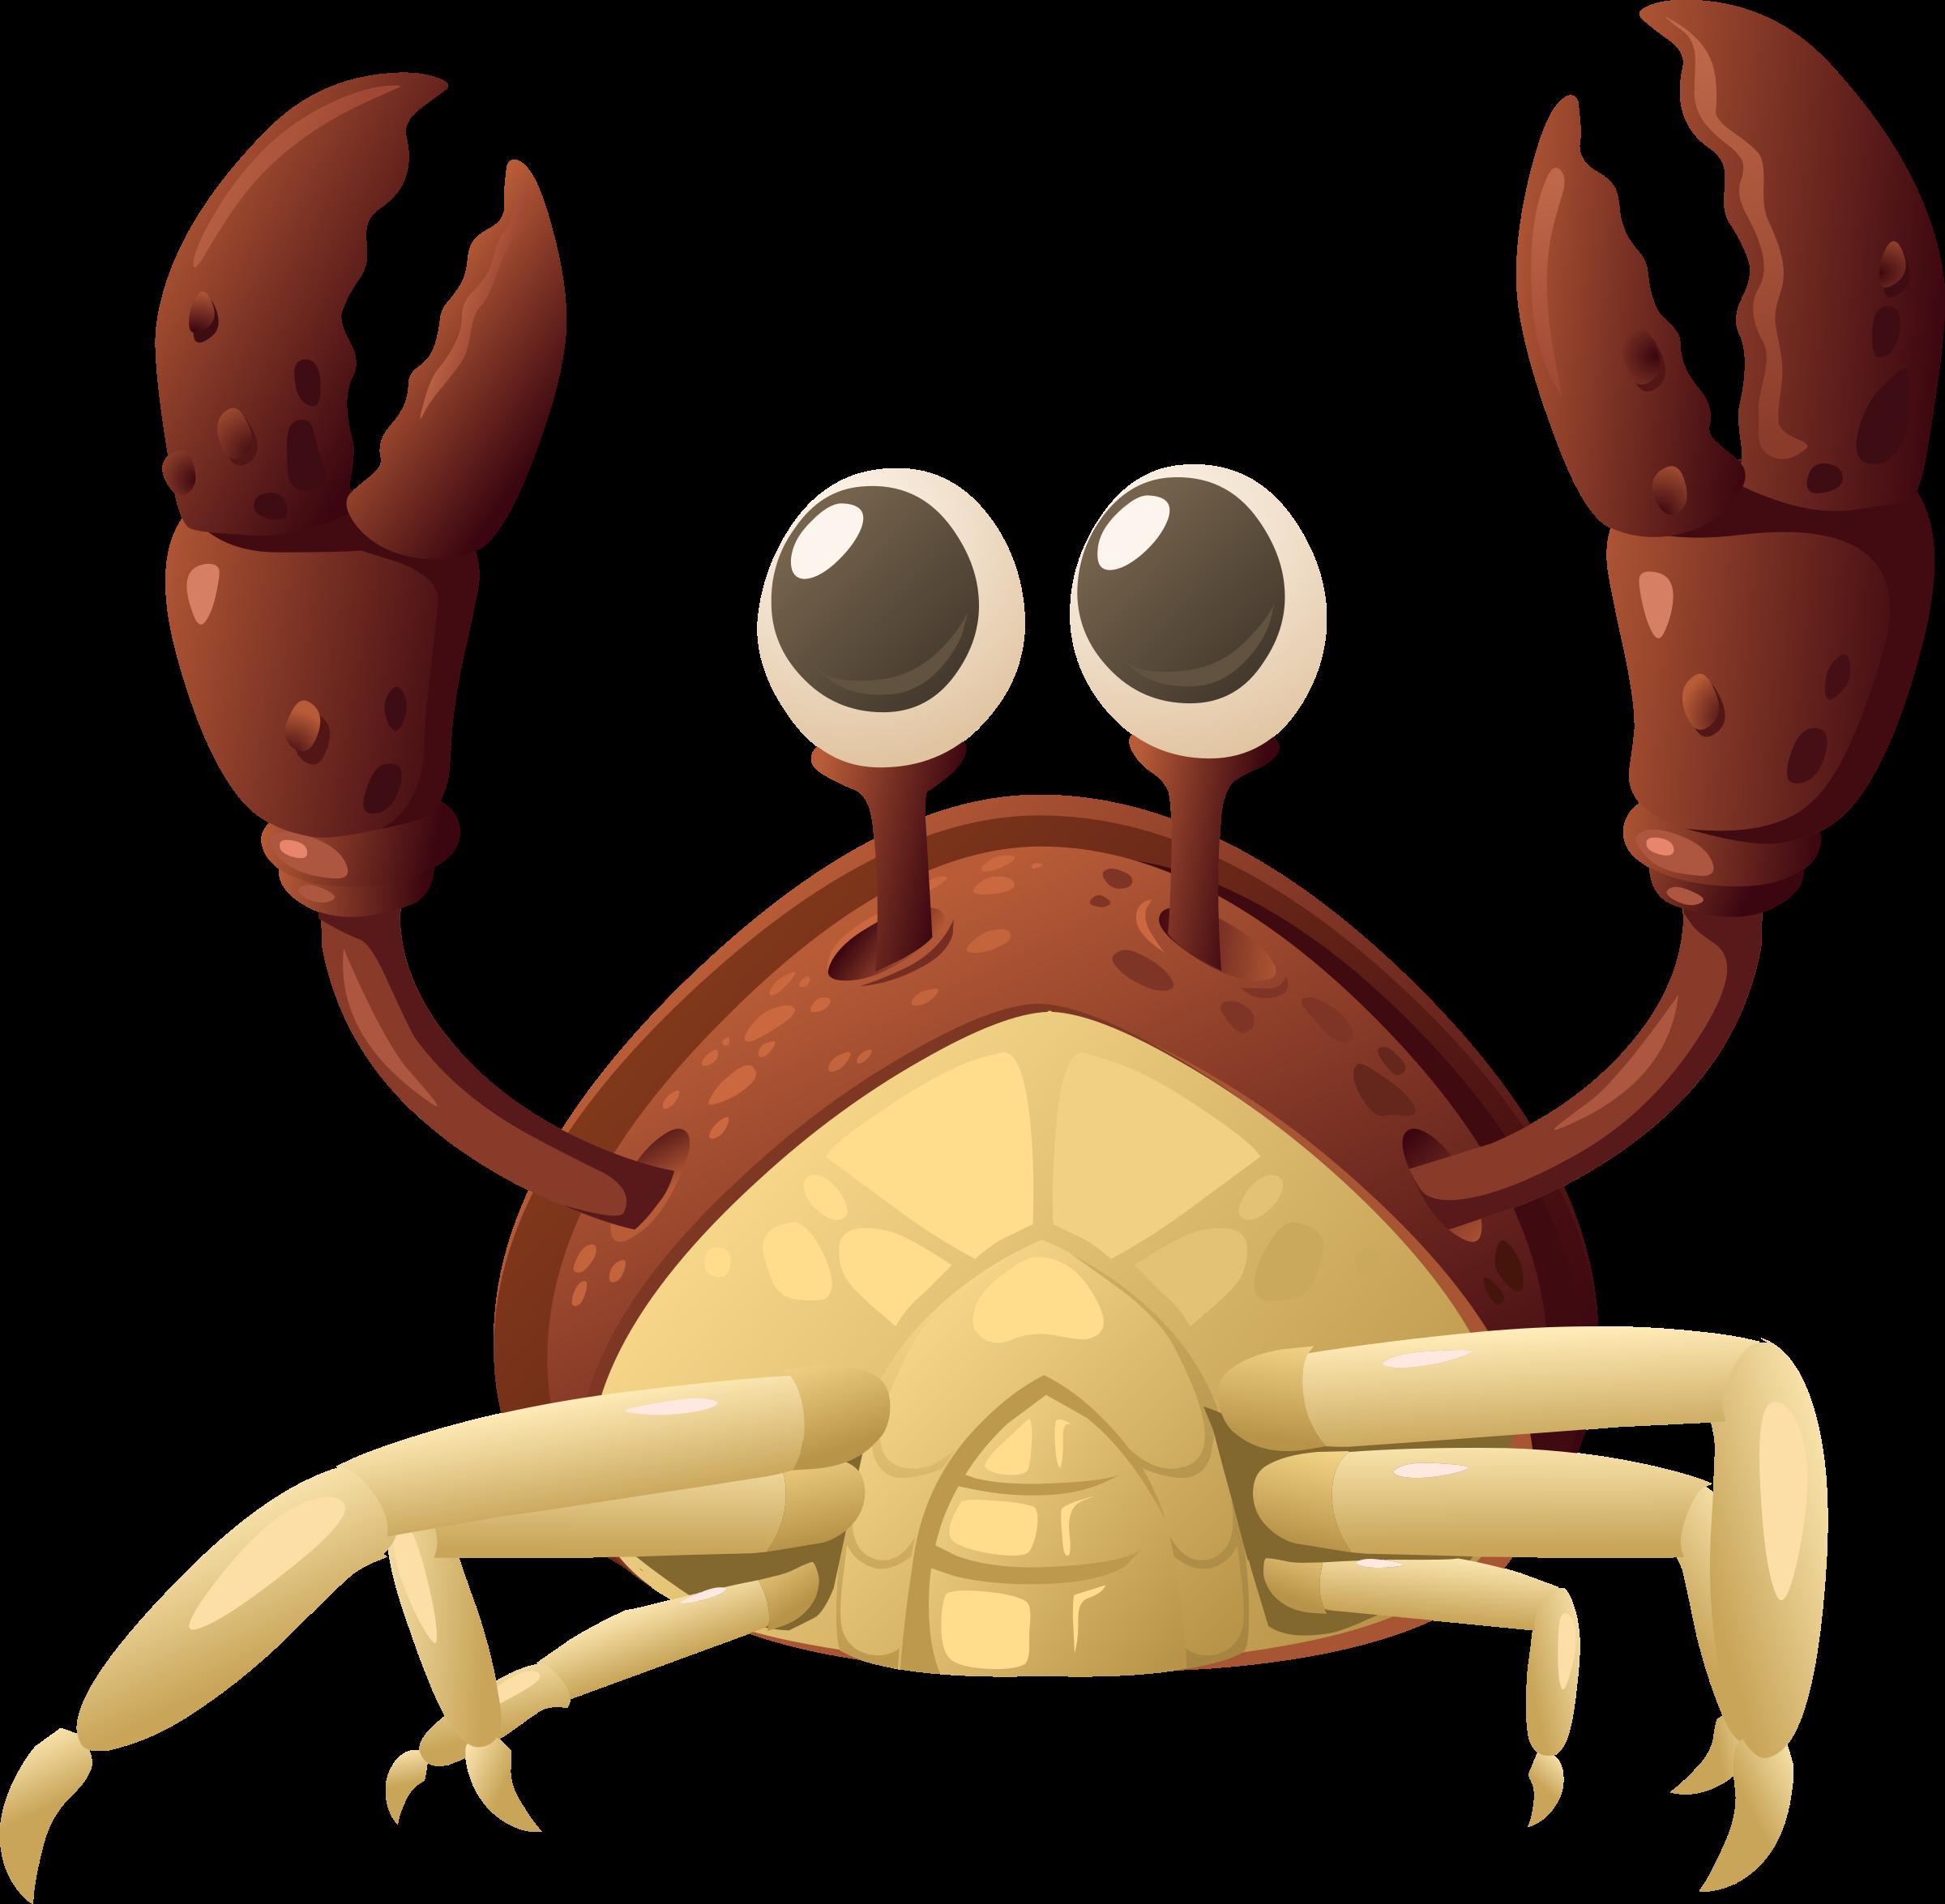 Inhabitants Npc Crab by glitch.